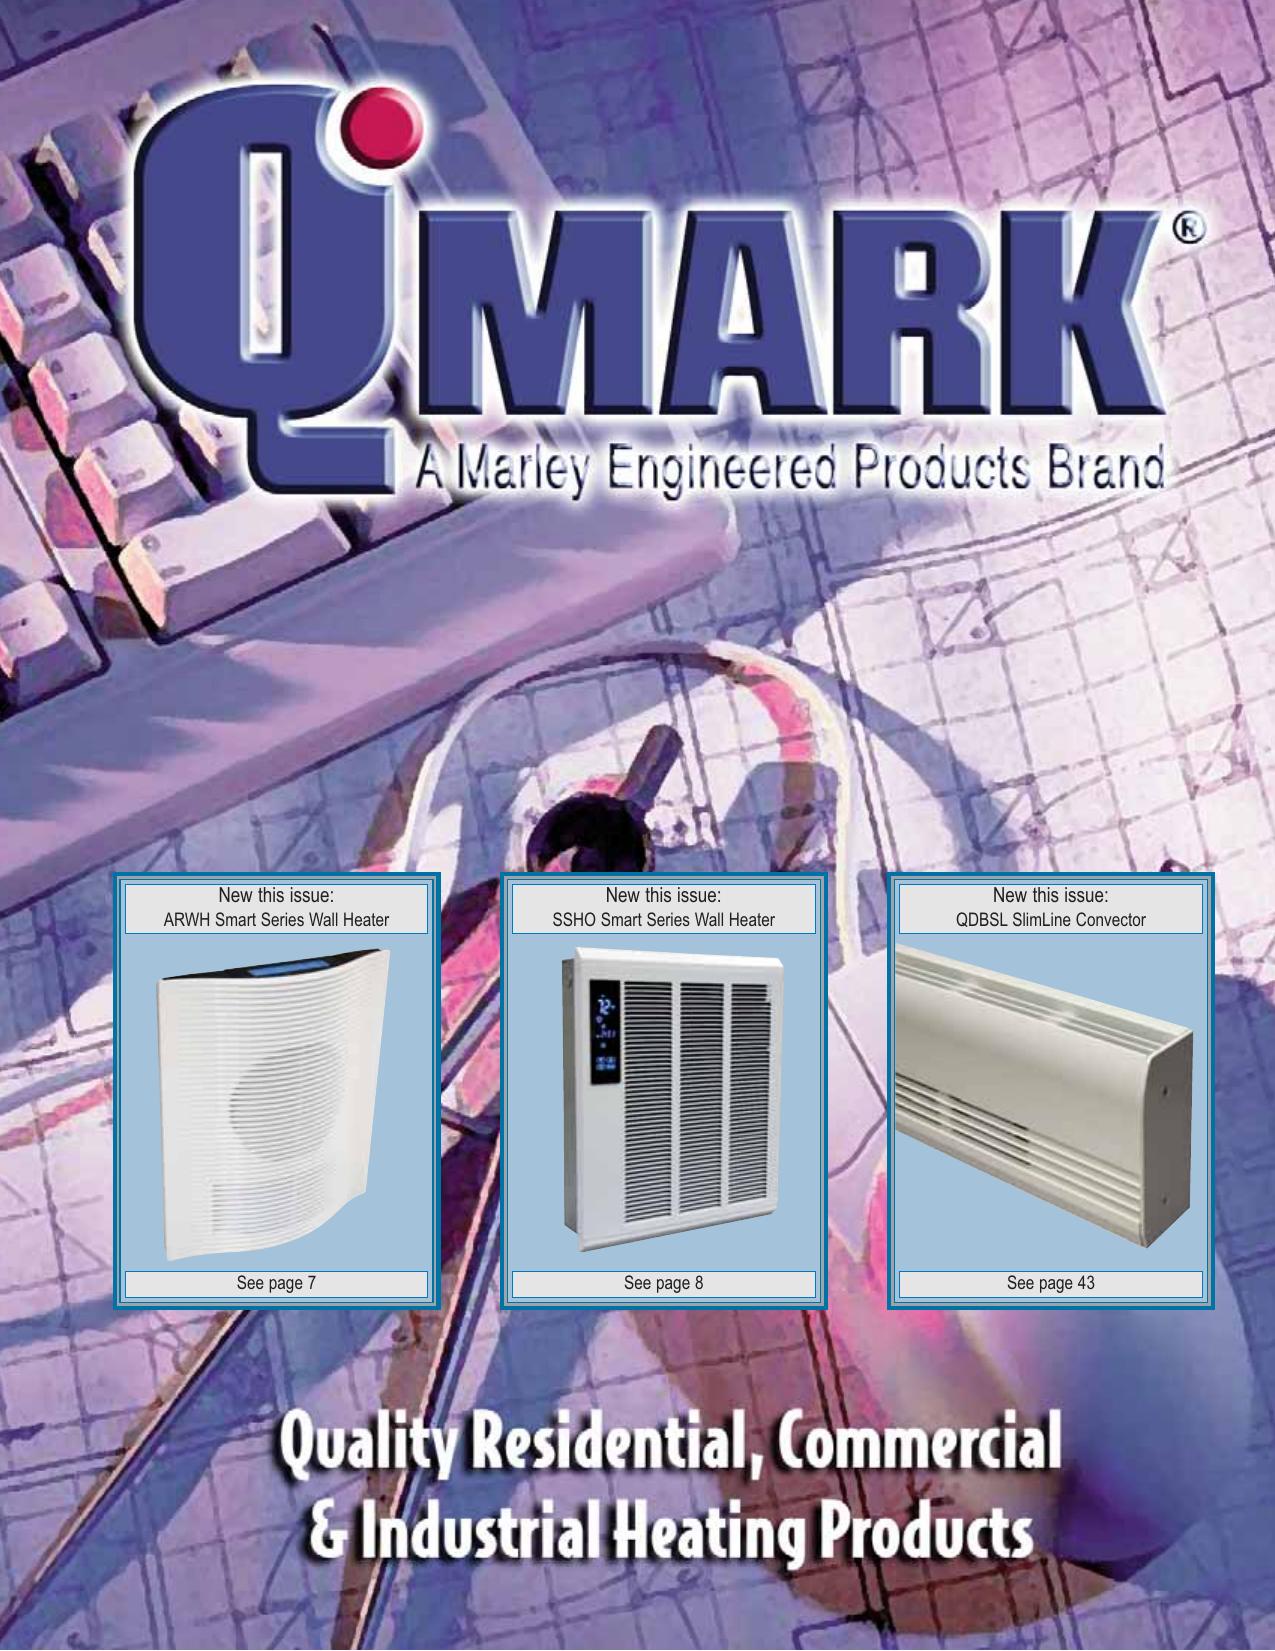 140809 Catalog 2 Rough Wiring Baseboard Heater